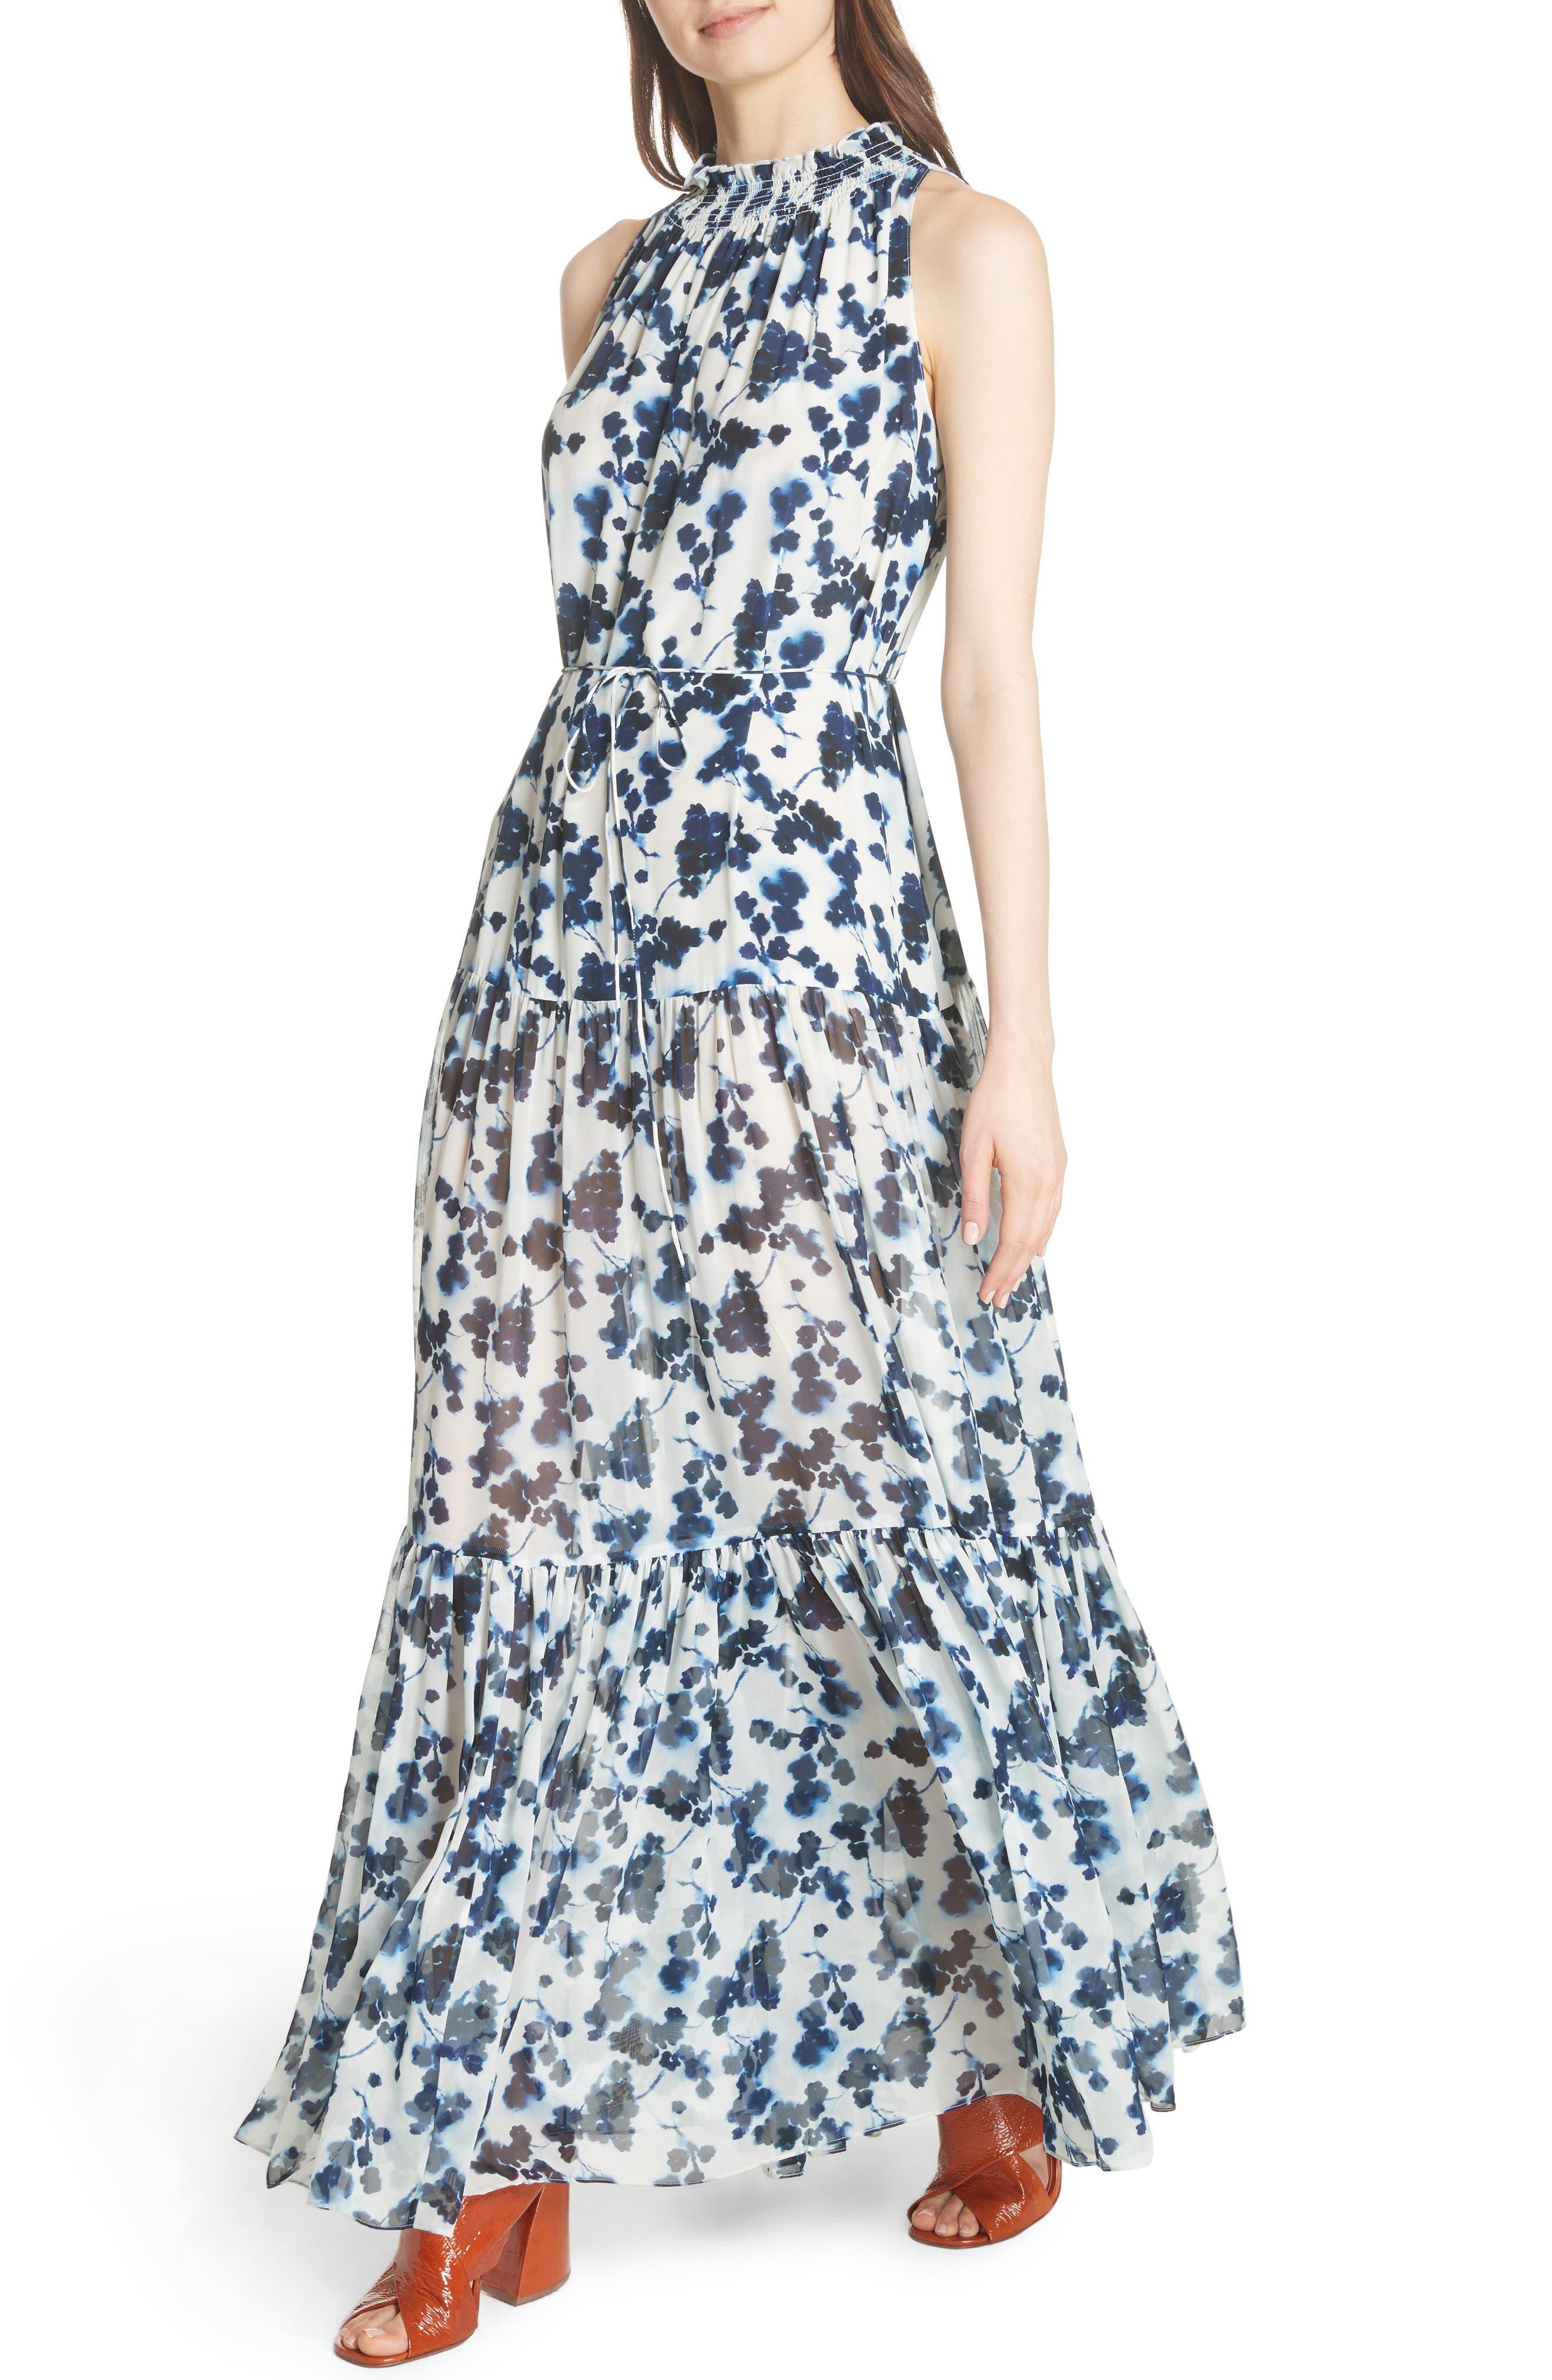 Lani P Floral Print Silk Dress,                             Alternate thumbnail 4, color,                             426